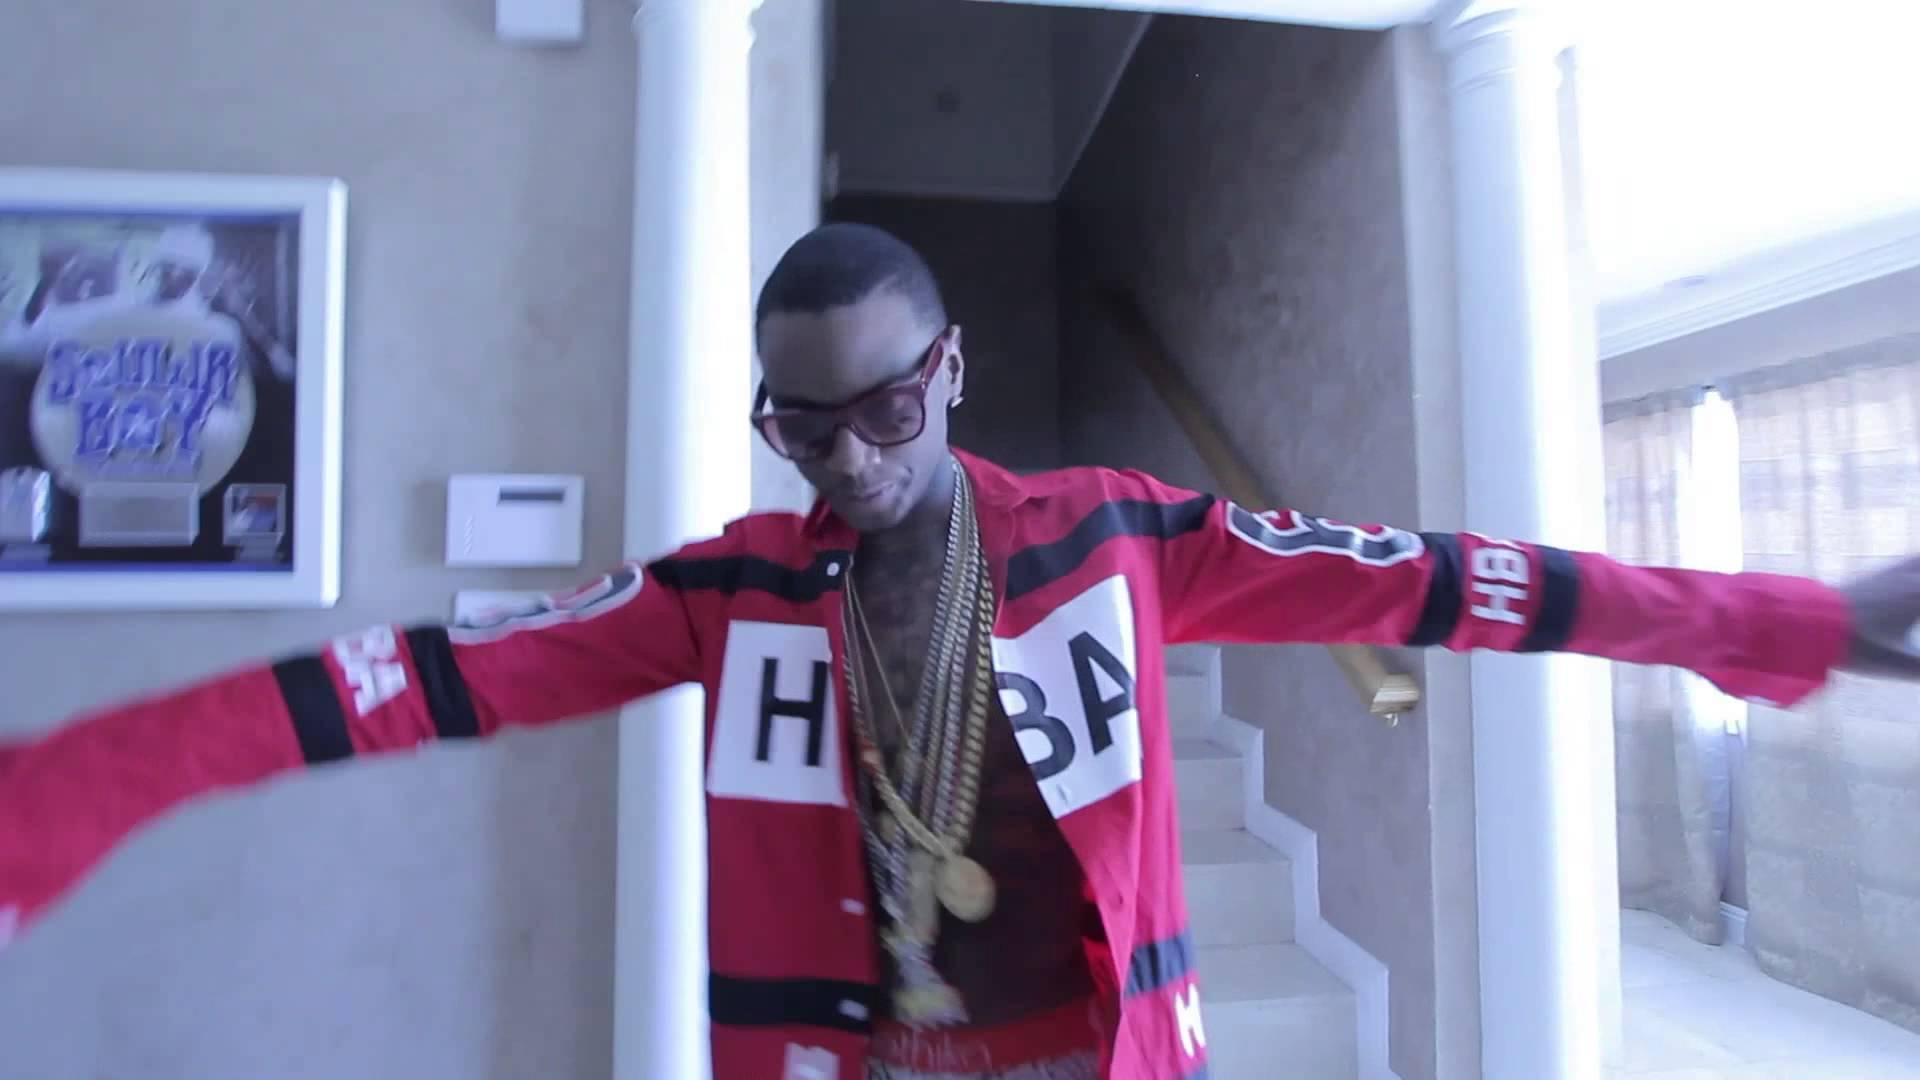 Soulja Boy – Swagg Like Me